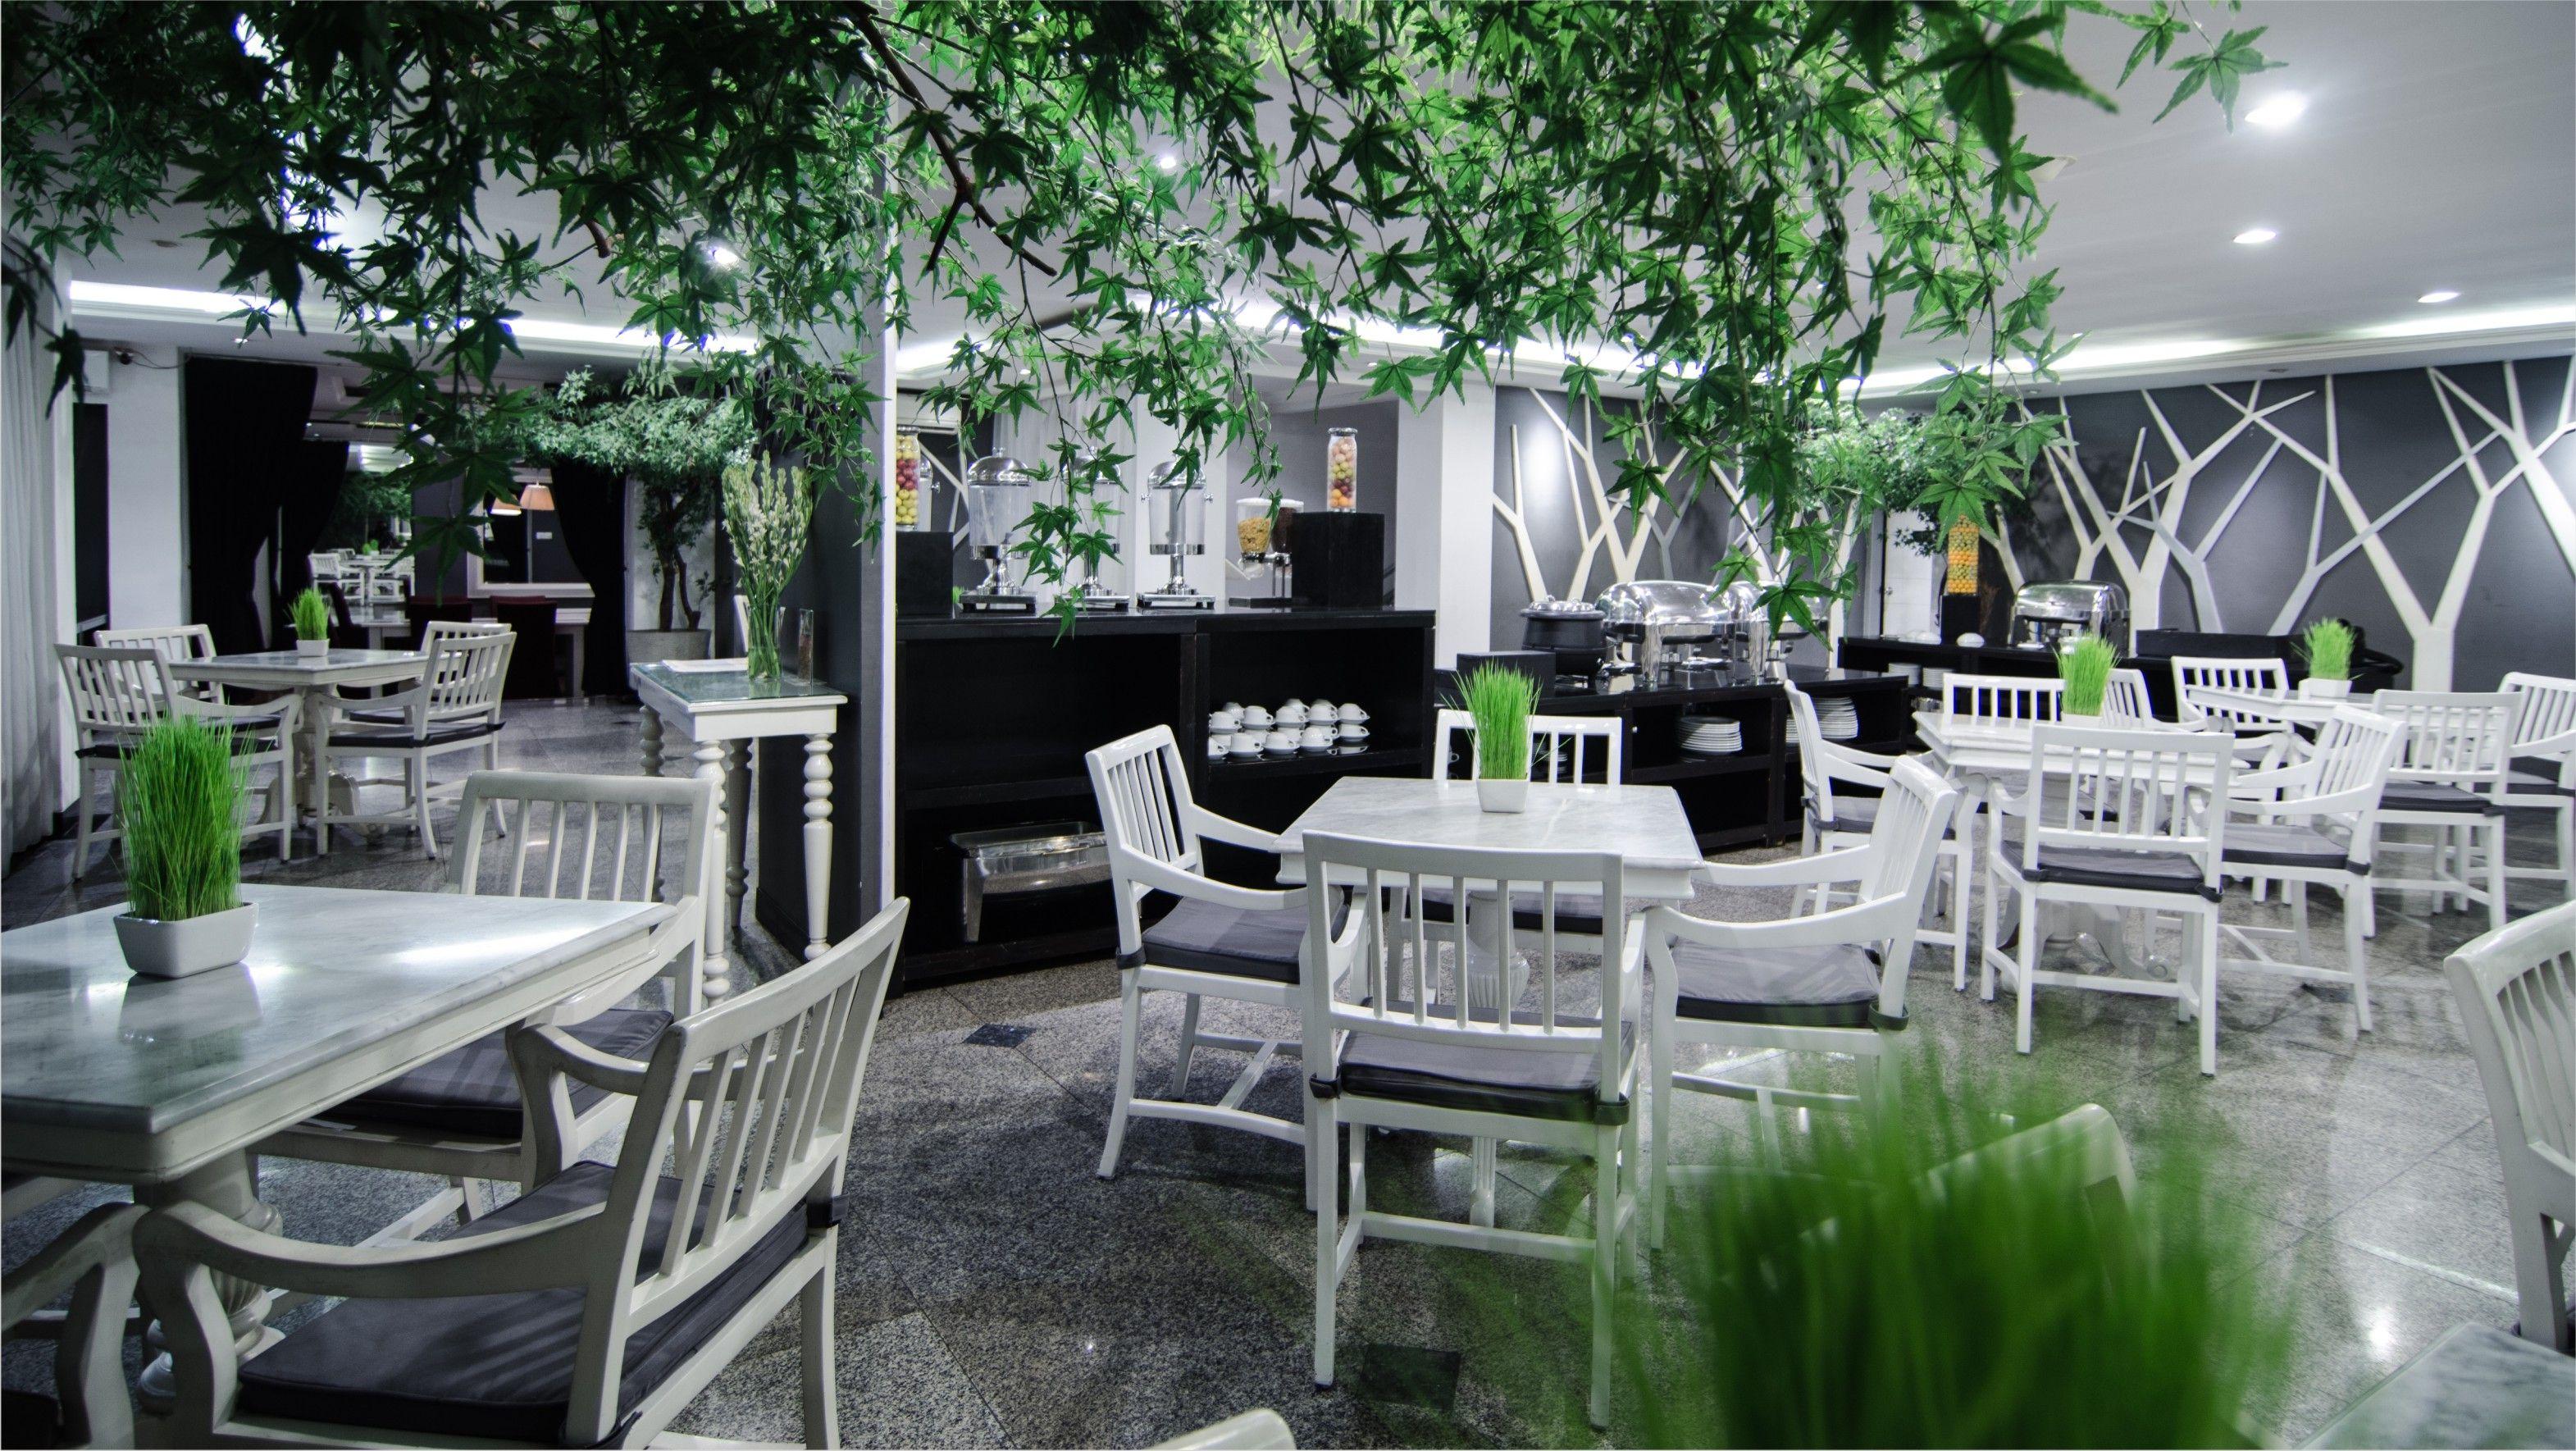 The Bellagio a 24 hour coffee shop